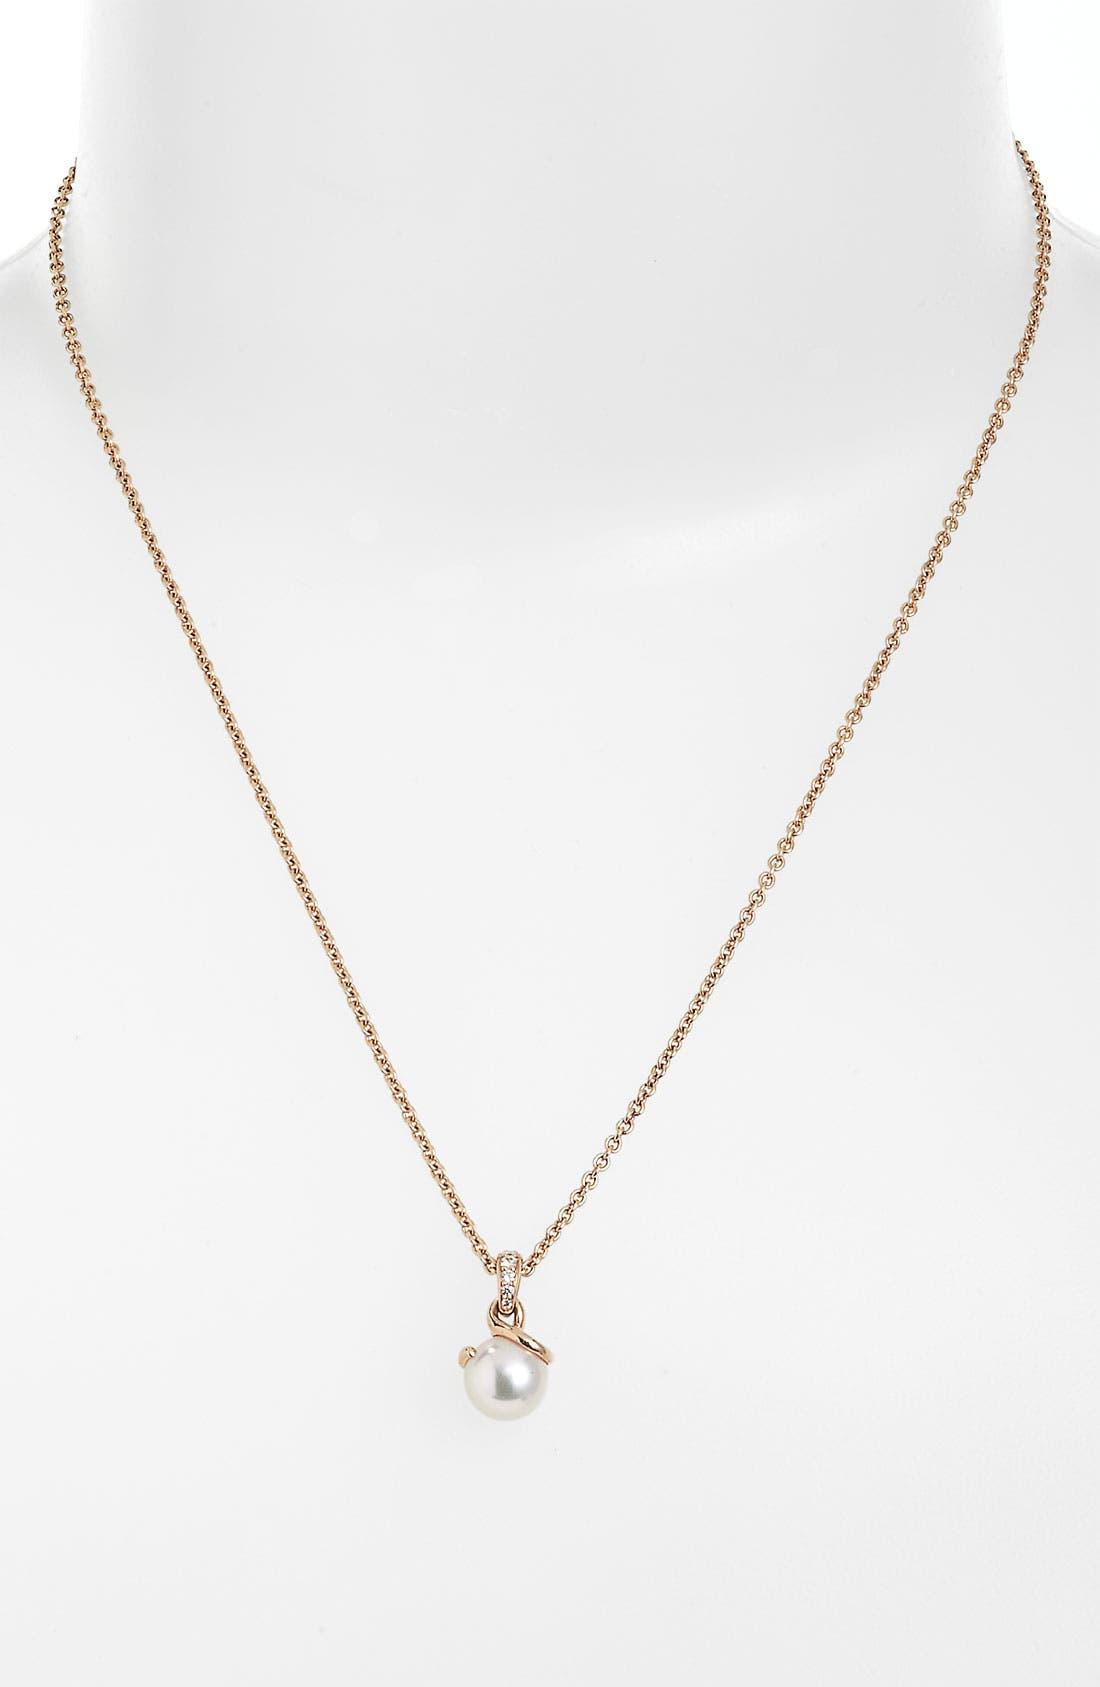 Main Image - Mikimoto Akoya Cultured Pearl & Diamond Pendant Necklace